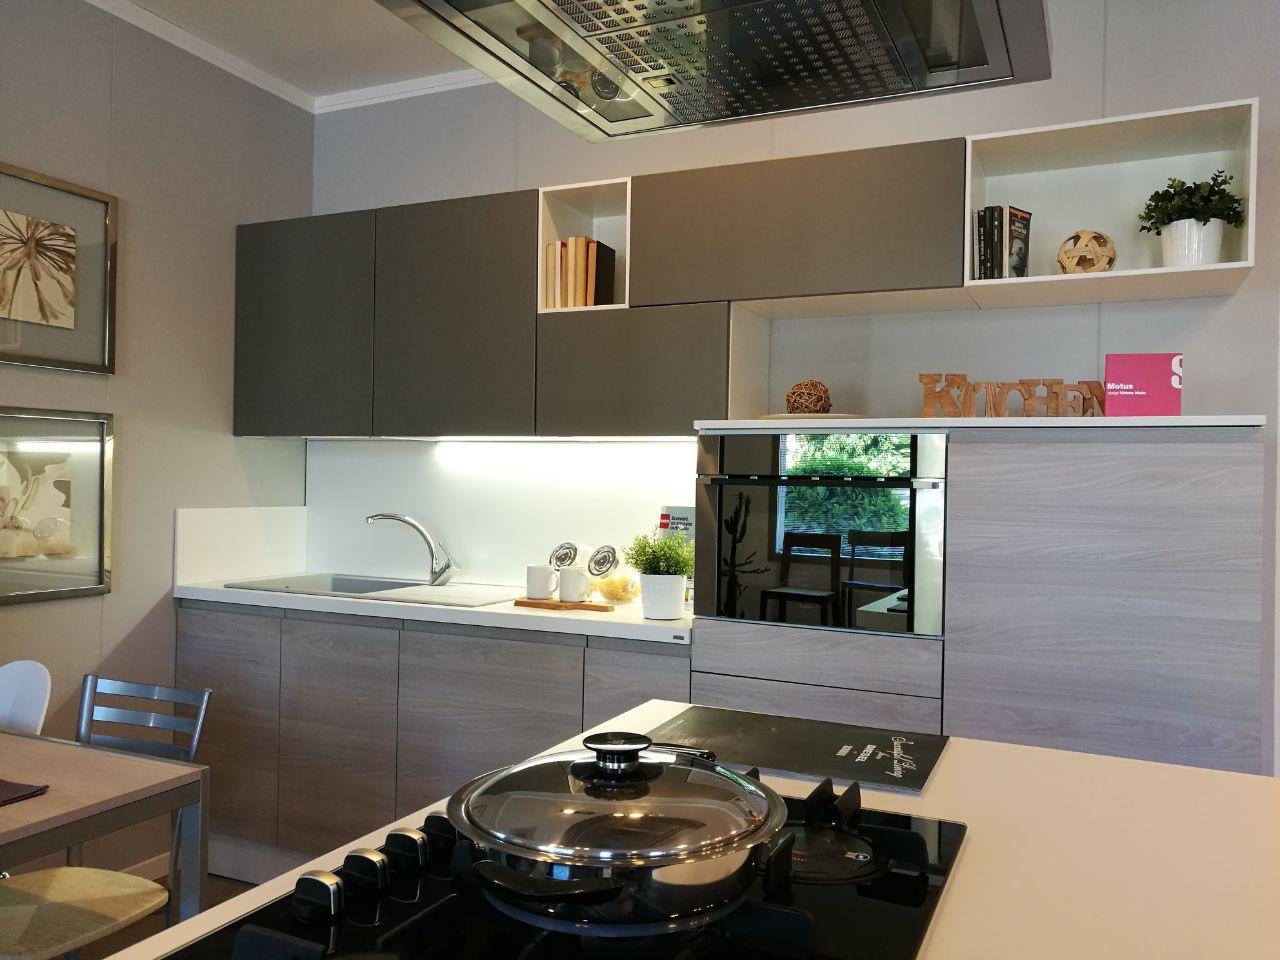 MOTUS Cucina Scavoliniin offerta per arredamento a Modena ...